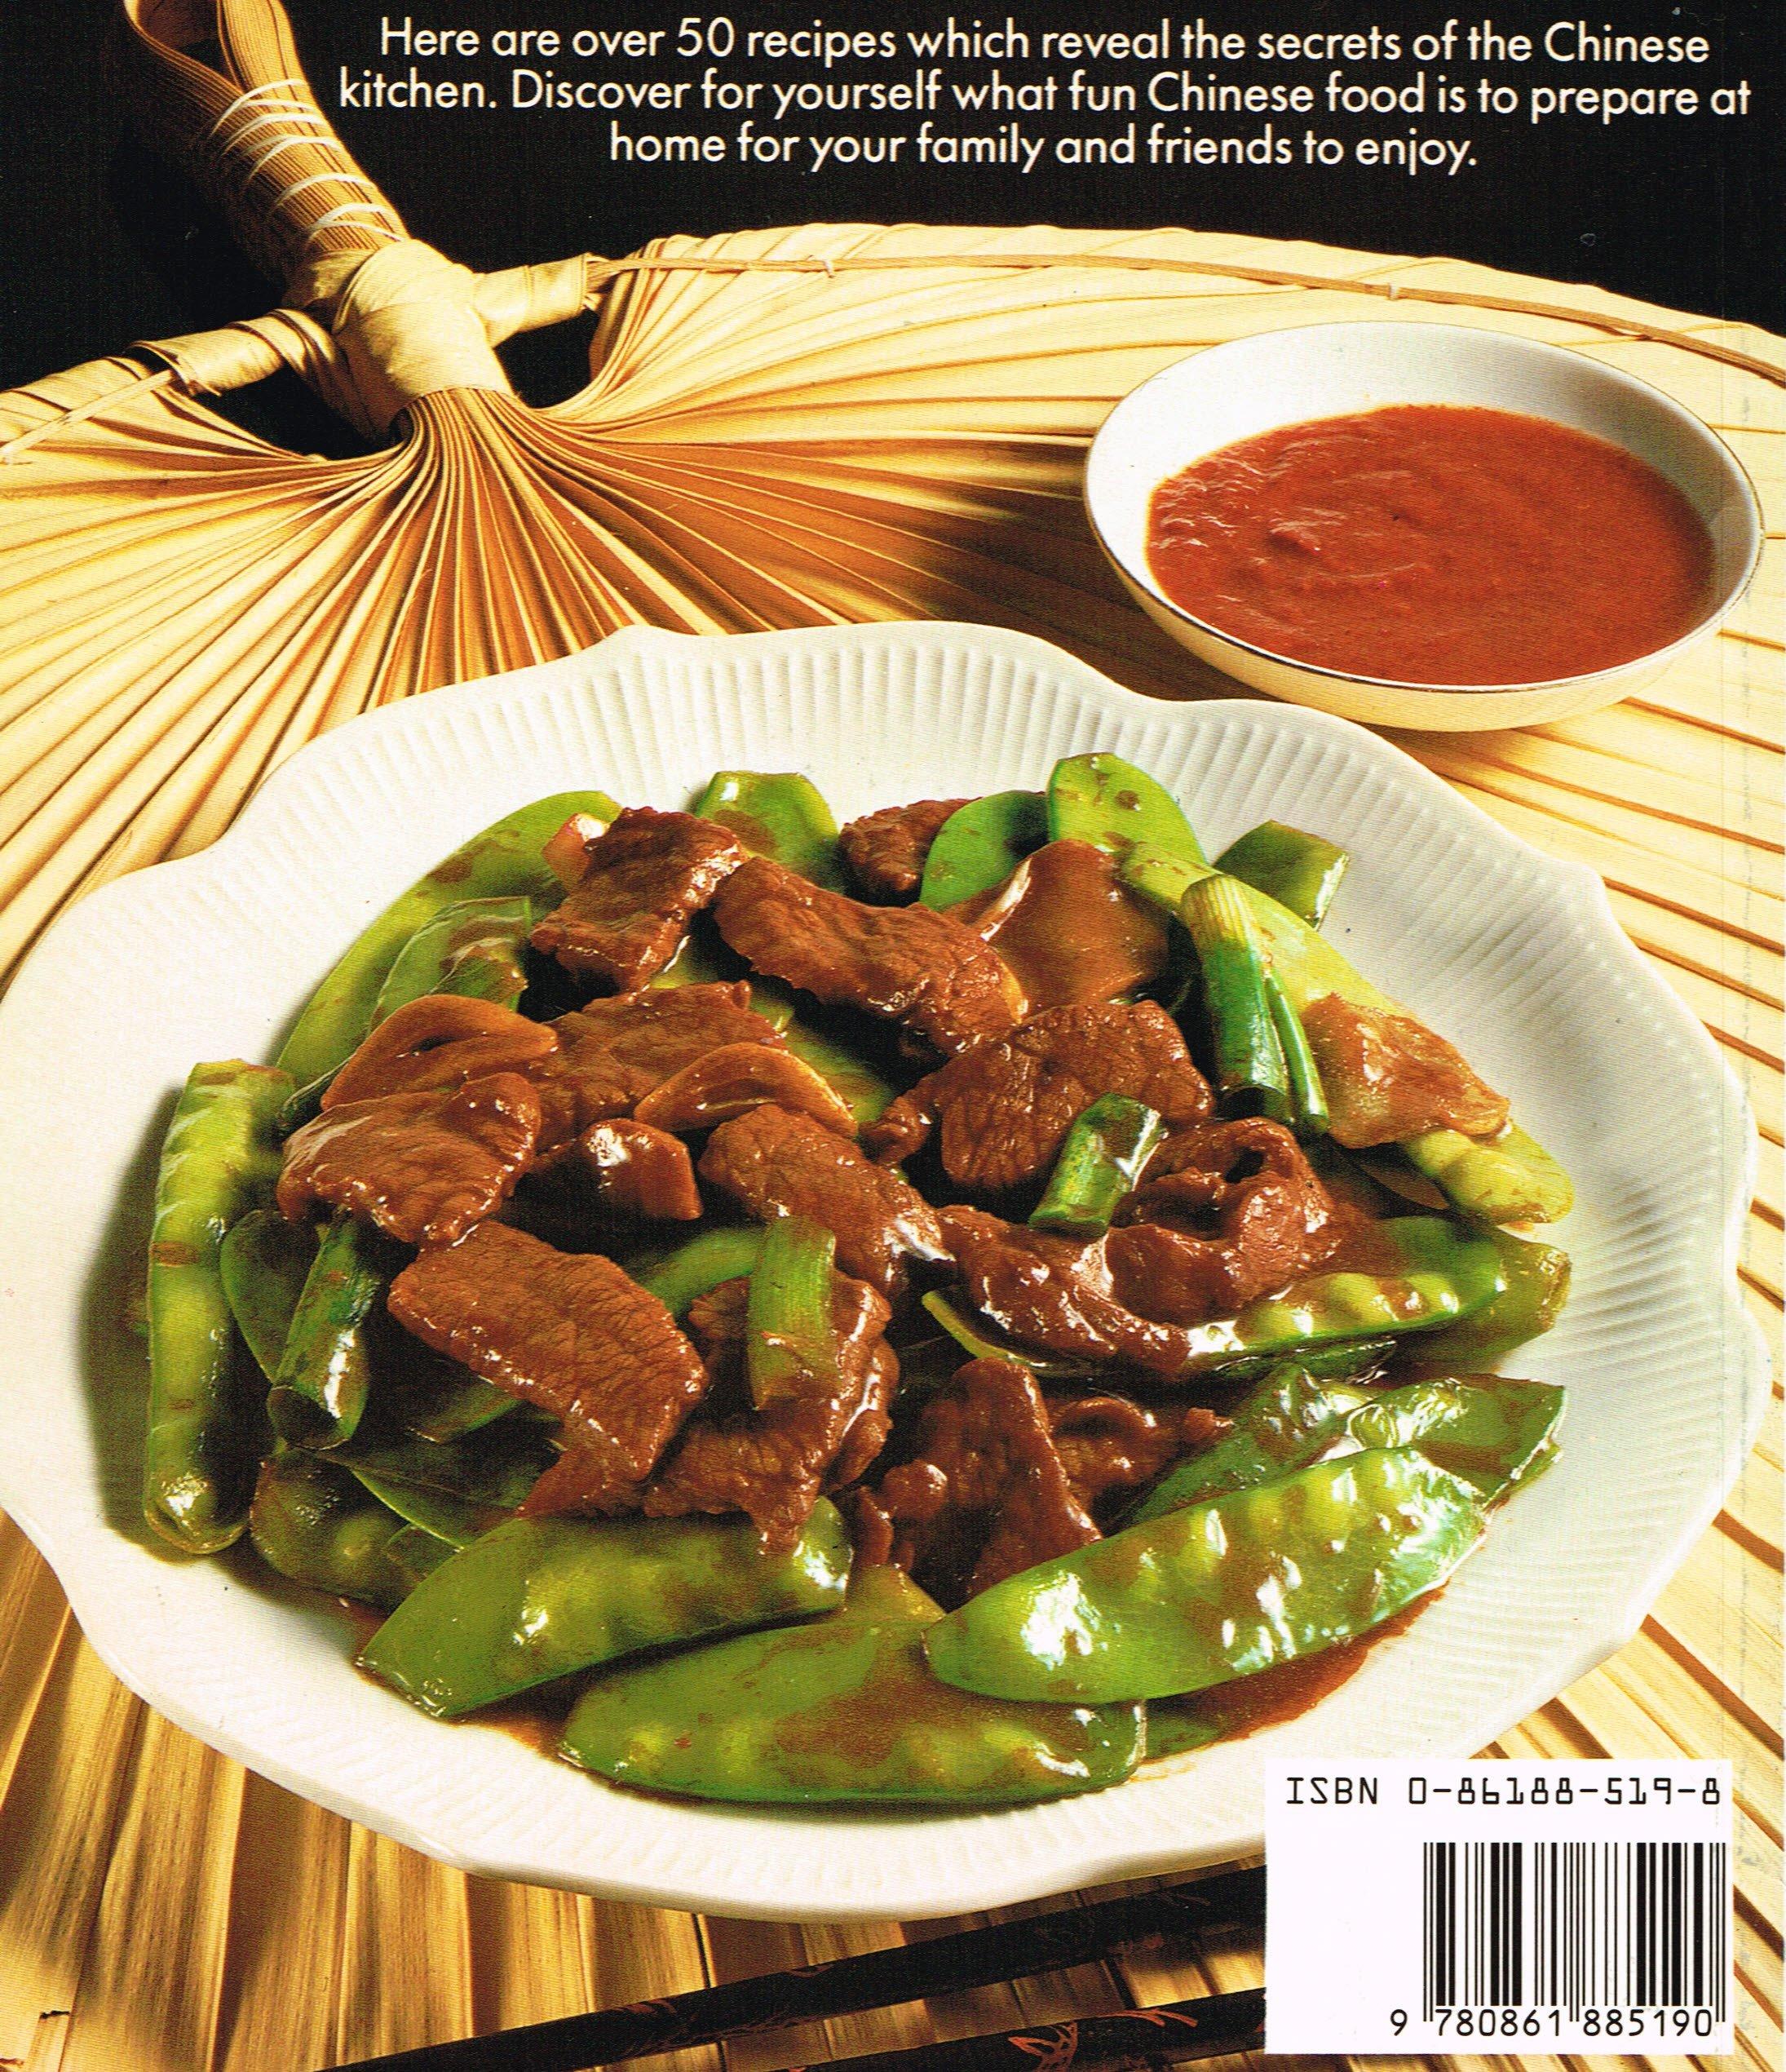 The wok cookbook yan kit so 9780861885190 amazon books forumfinder Images